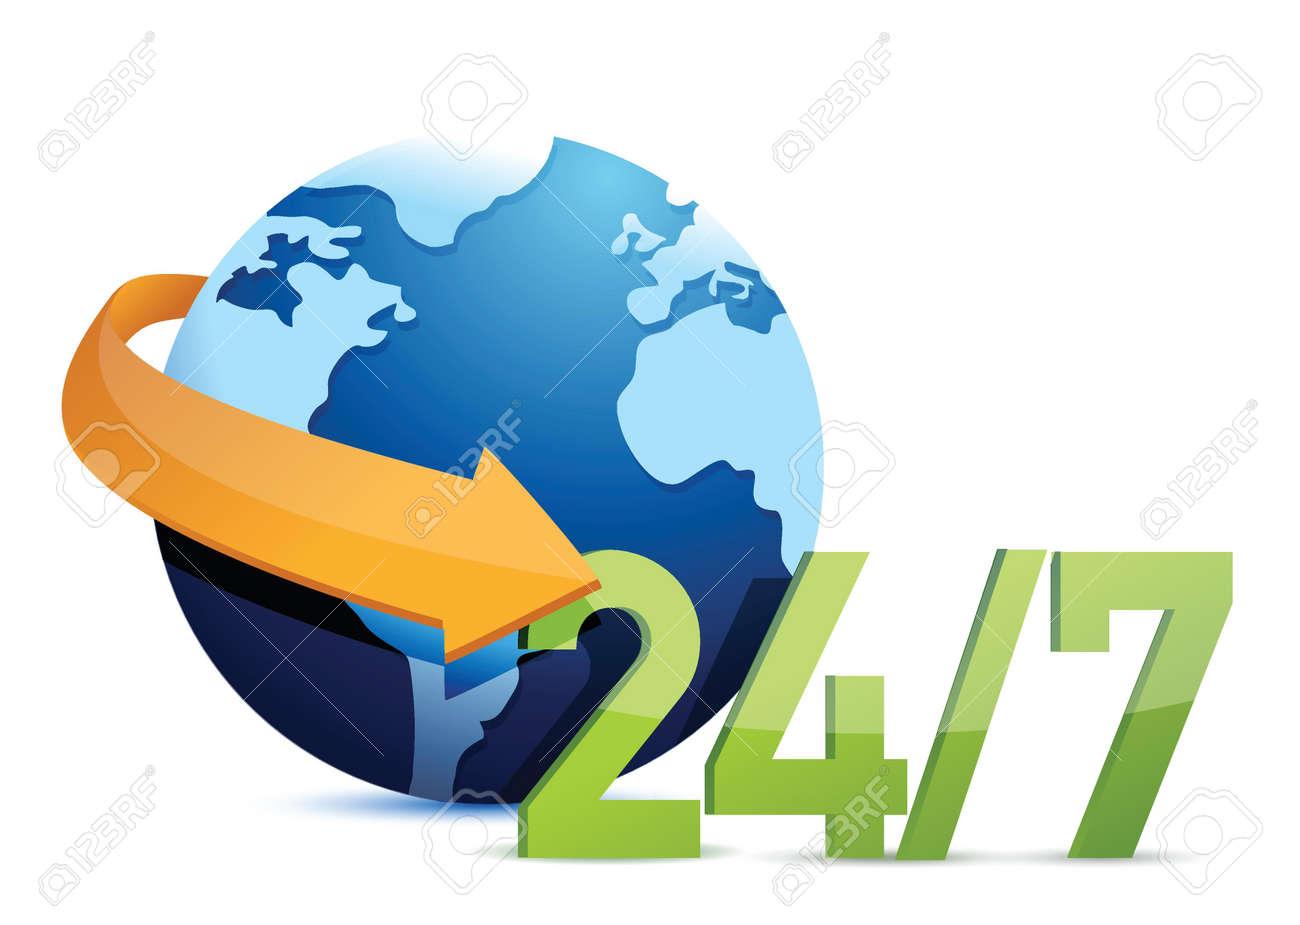 globe all day service concept illustration design over a white background Stock Vector - 17872123